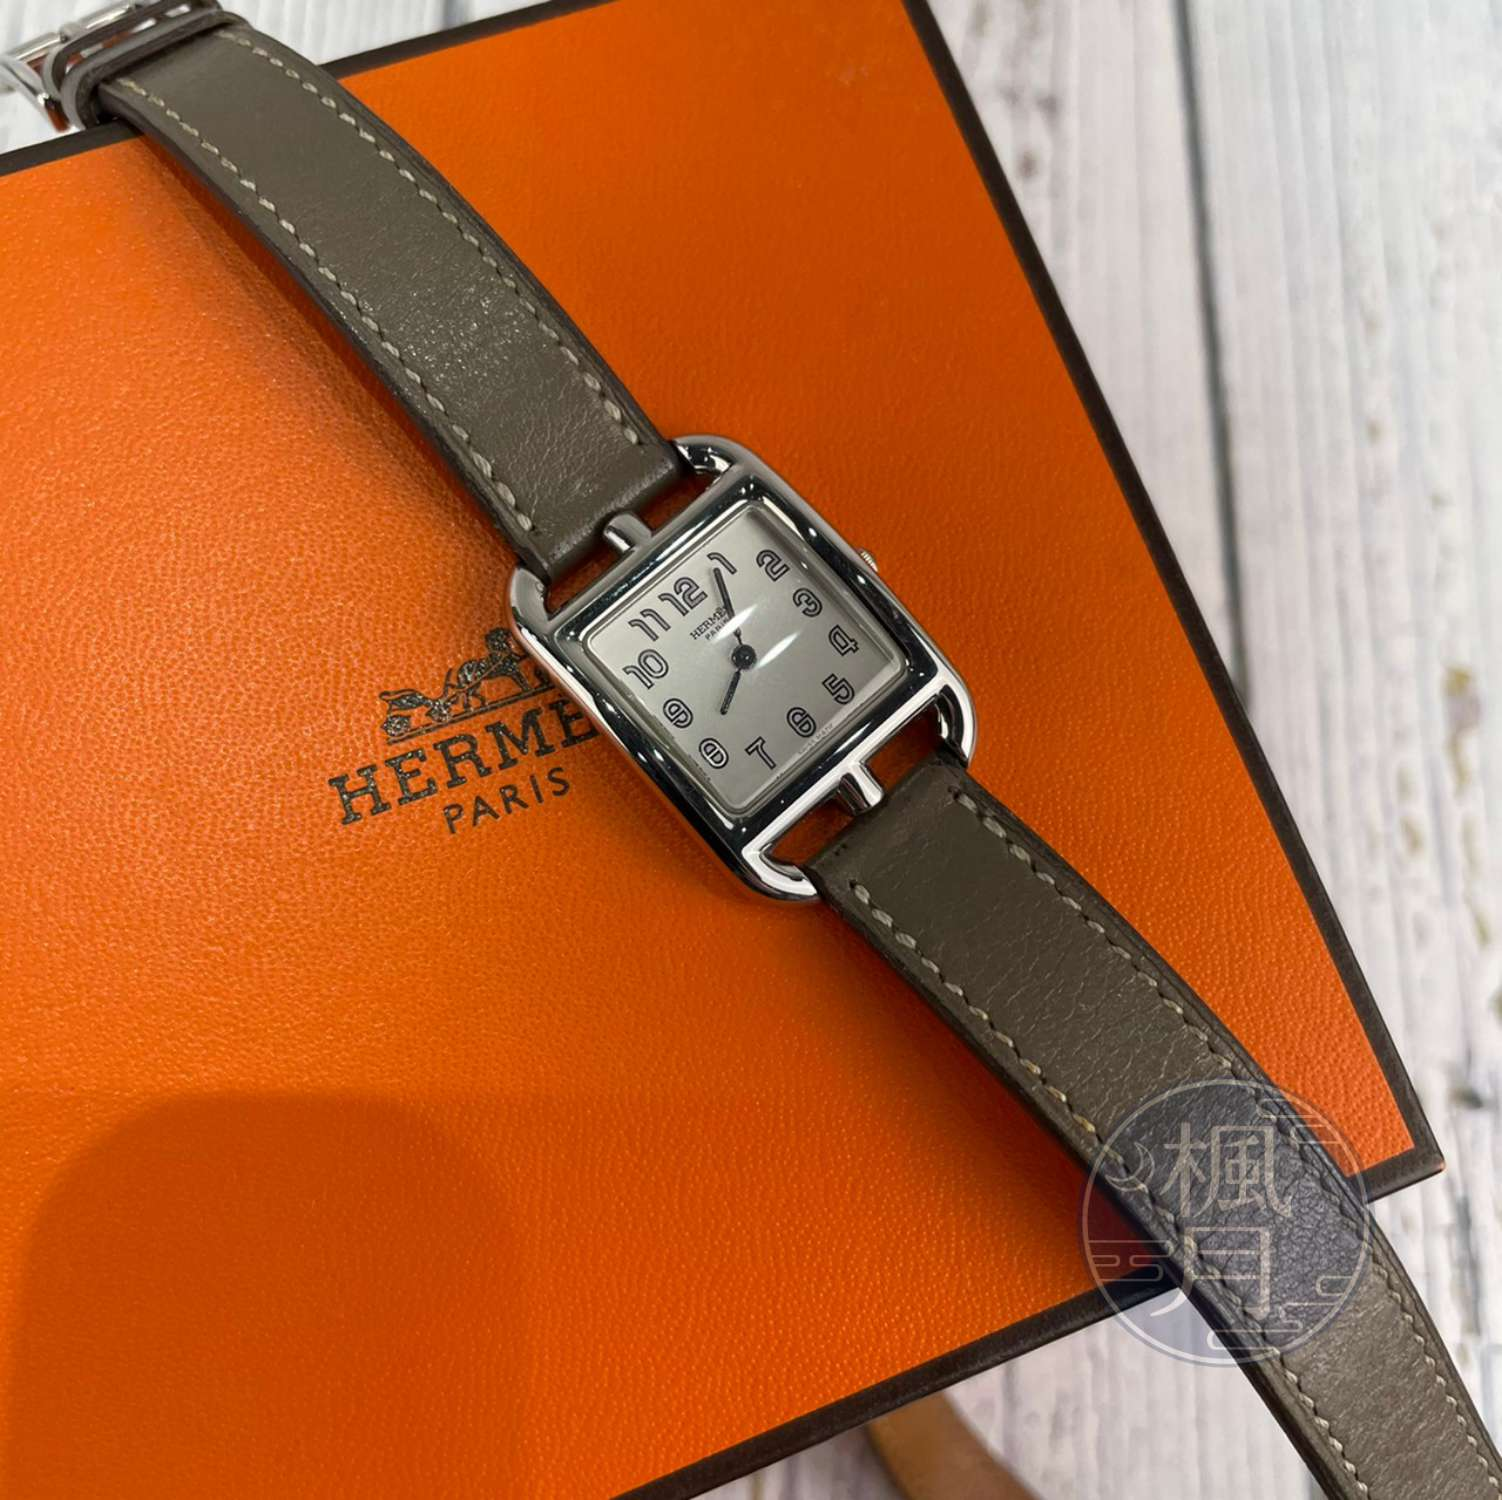 BRAND楓月 HERMES 愛馬仕 CC1.210 H女錶 QZ 石英錶 手錶 腕錶 時計 方錶盤 銀針 雙圈錶帶設計